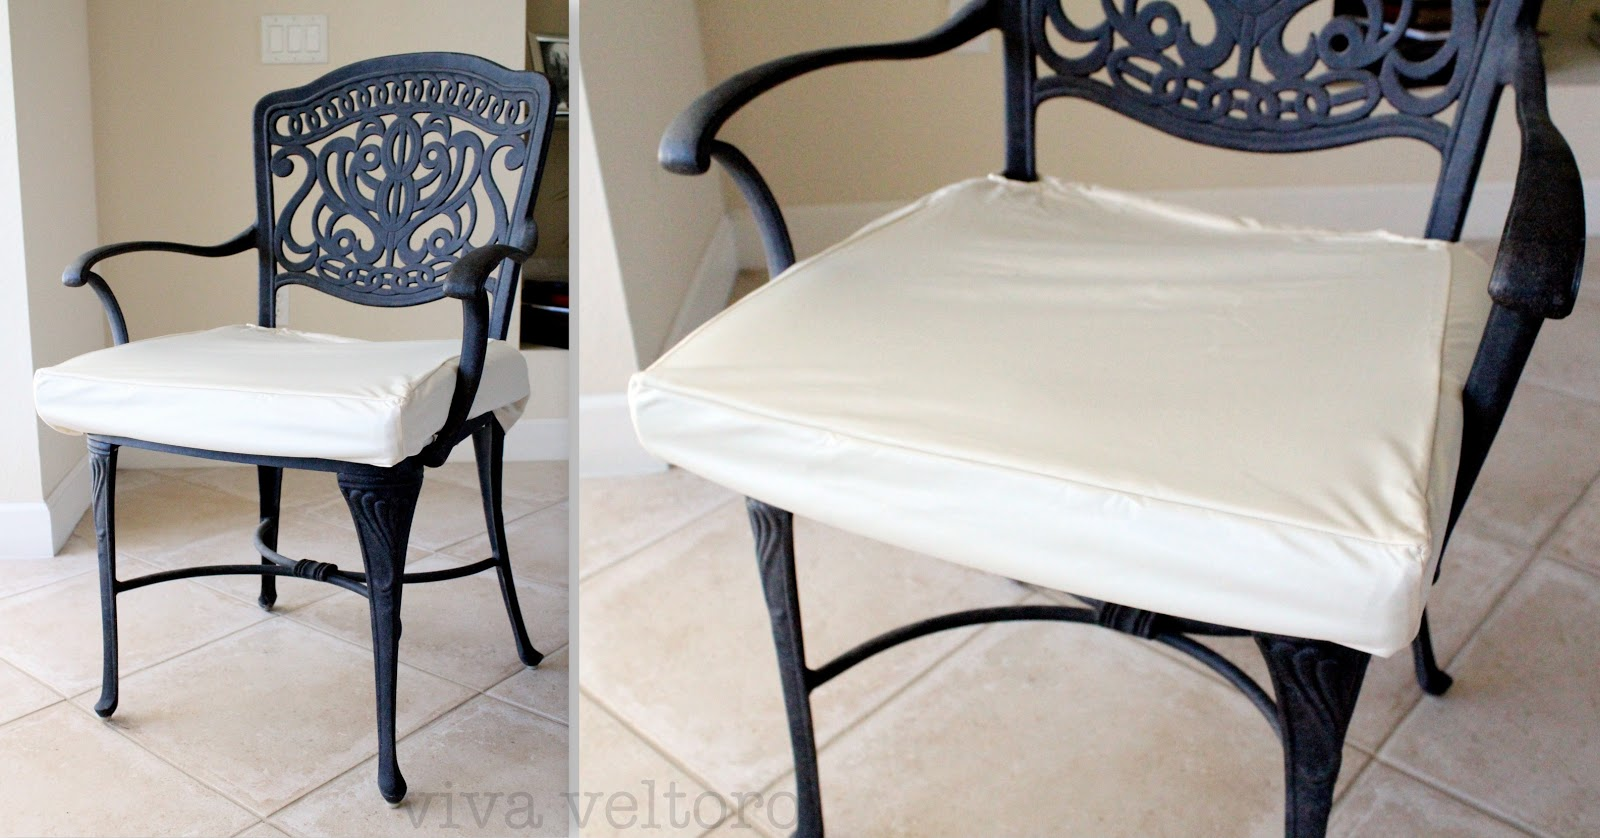 chair cover elegance pottery barn slipcover and a half vive vita everyday covers review viva veltoro